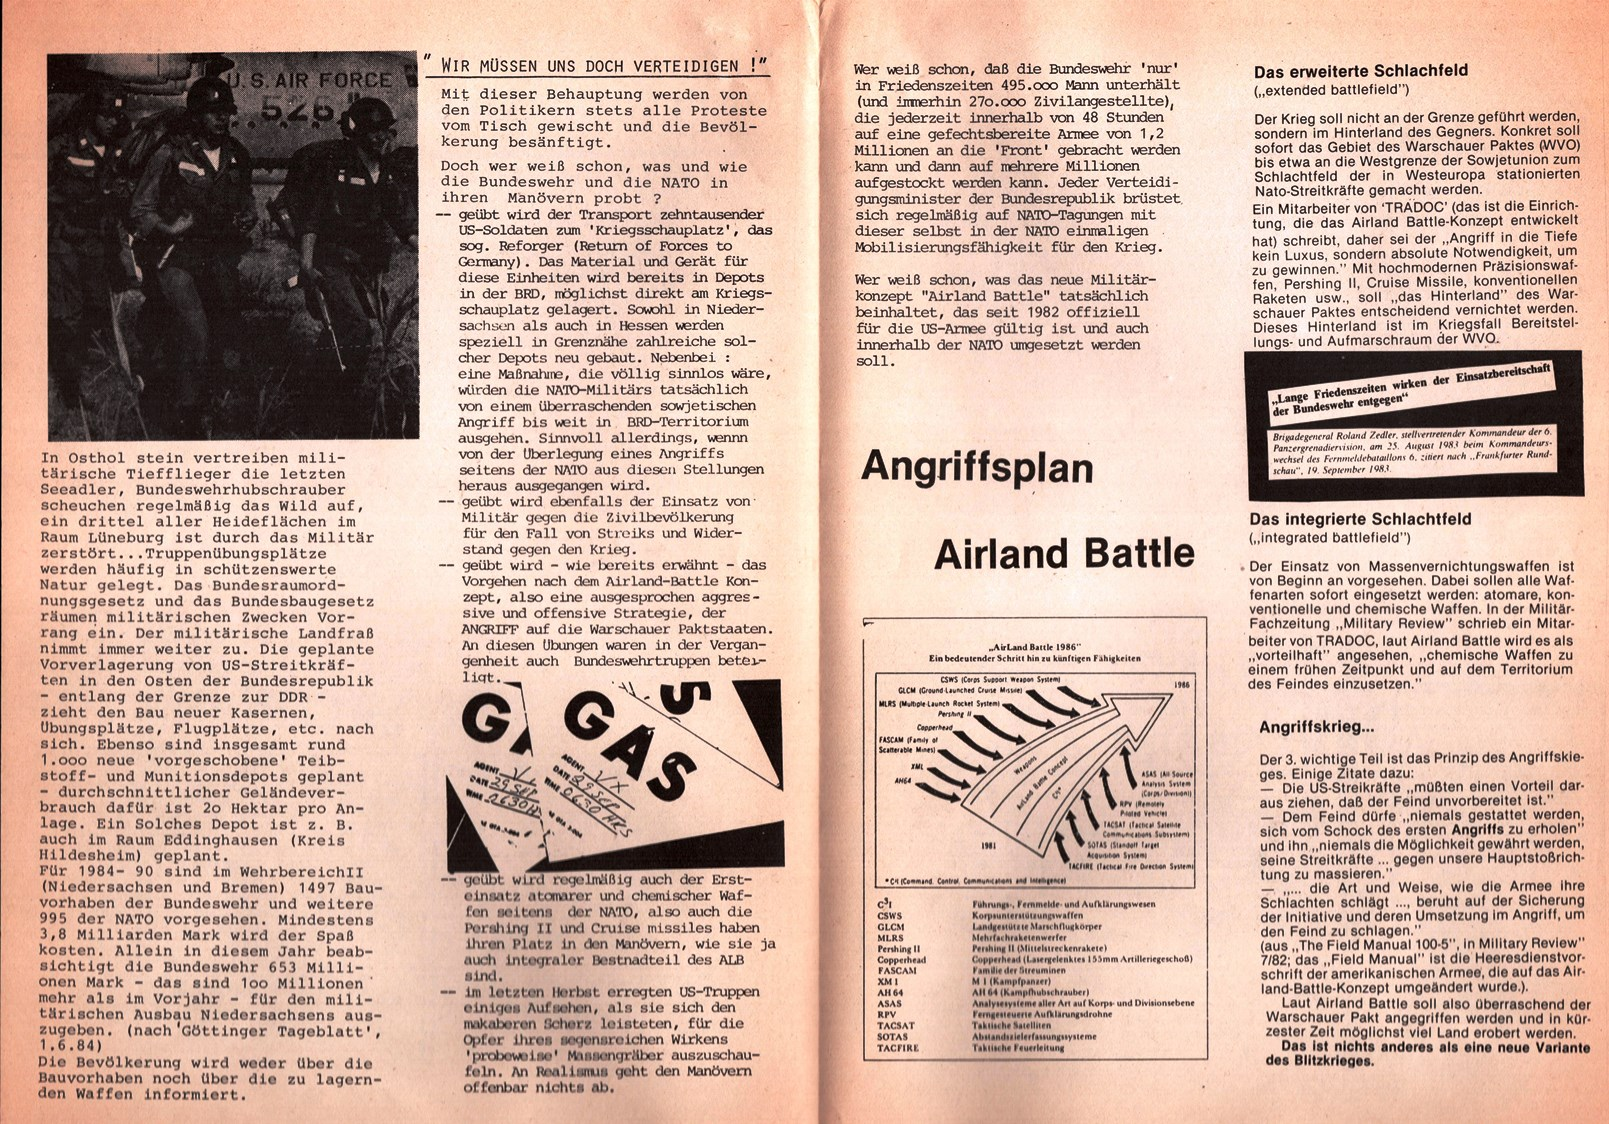 Hildesheim_1984_Manoeverbehinderung_006